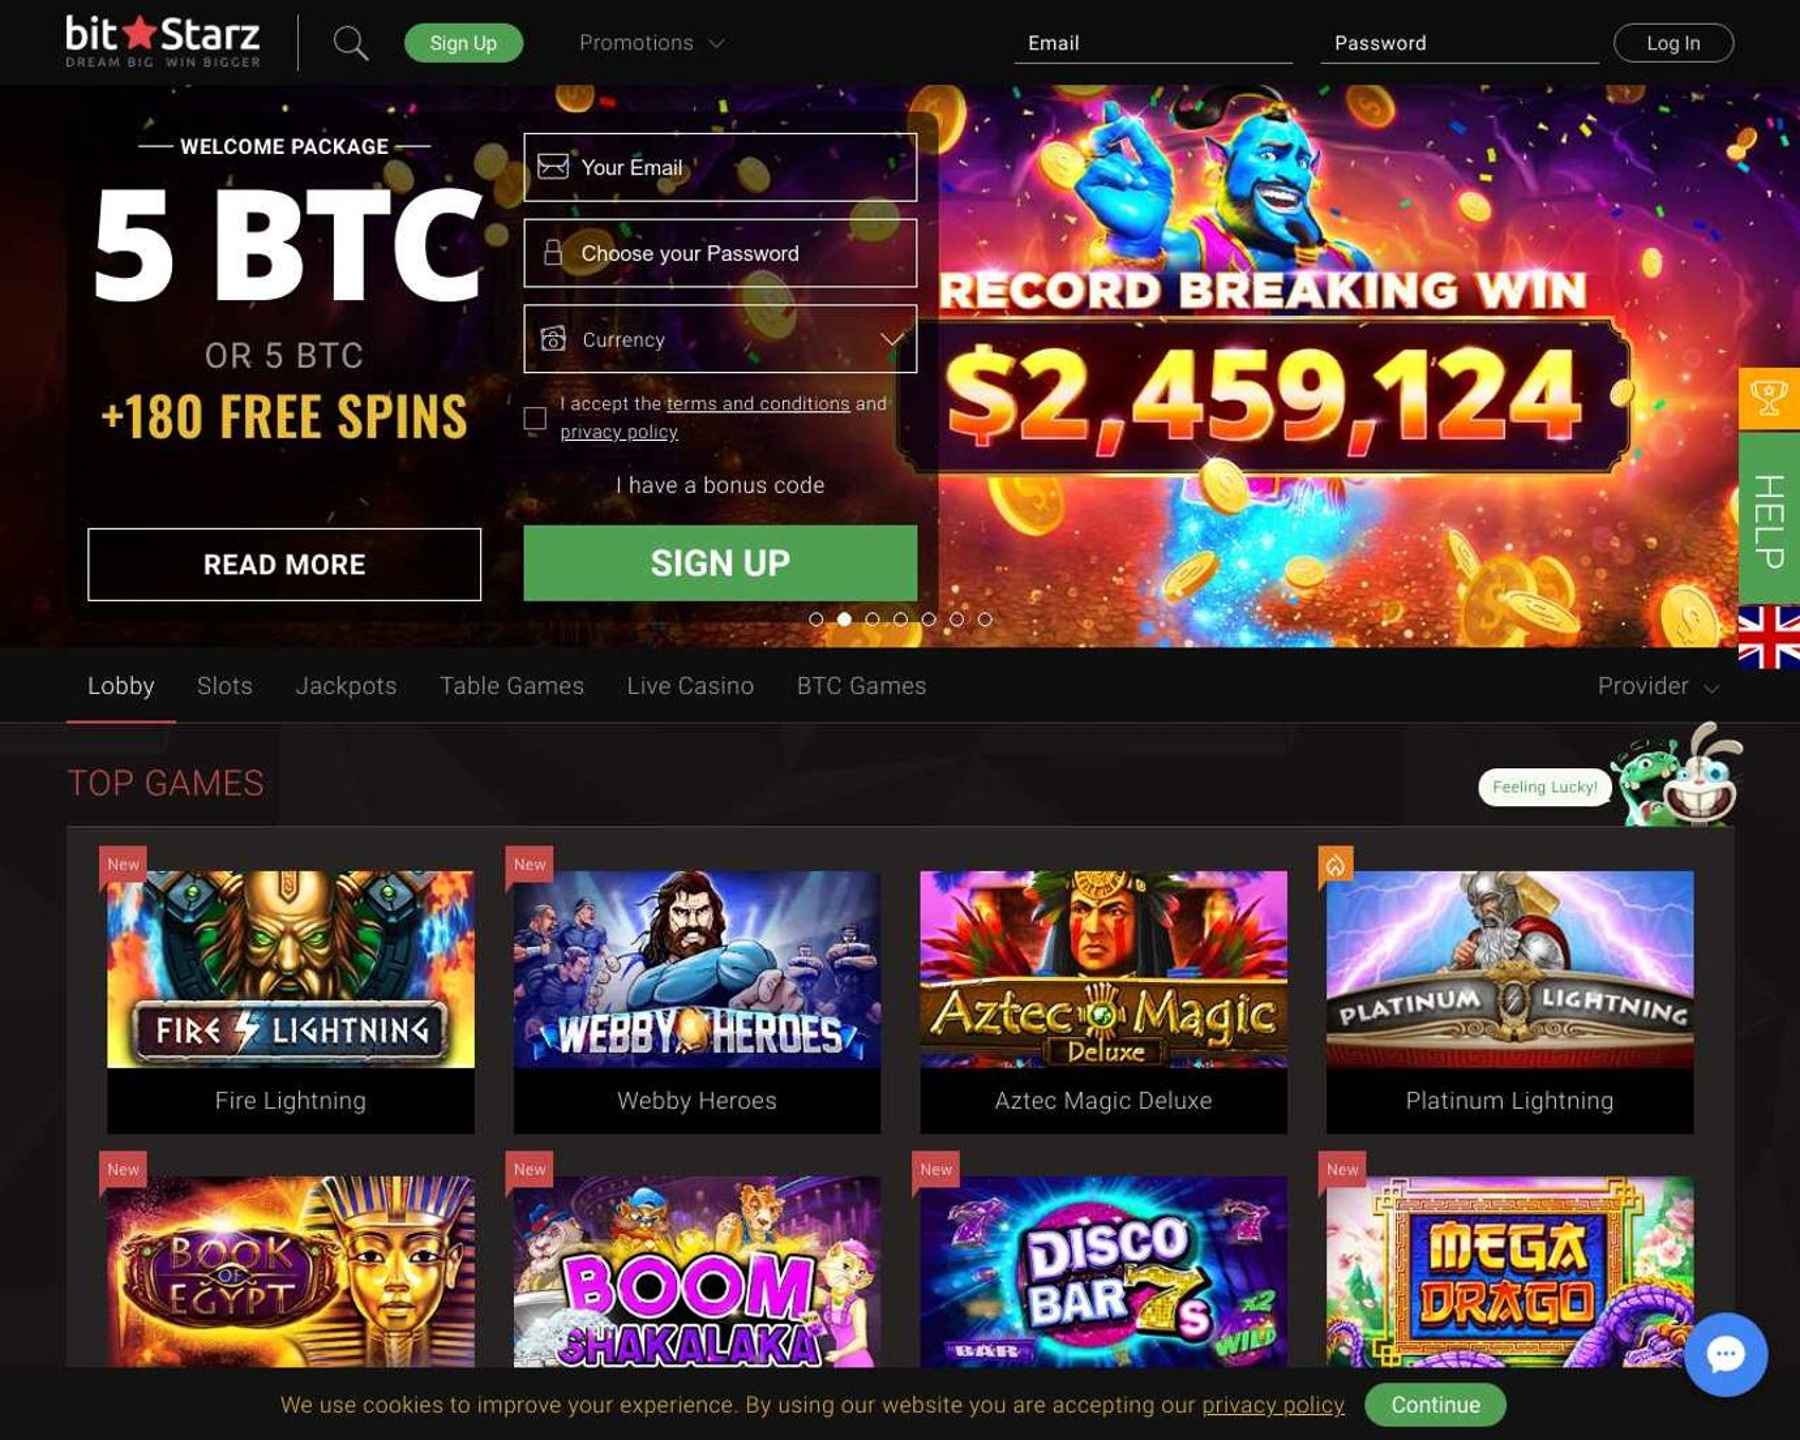 официальный сайт bitstarz casino зеркало